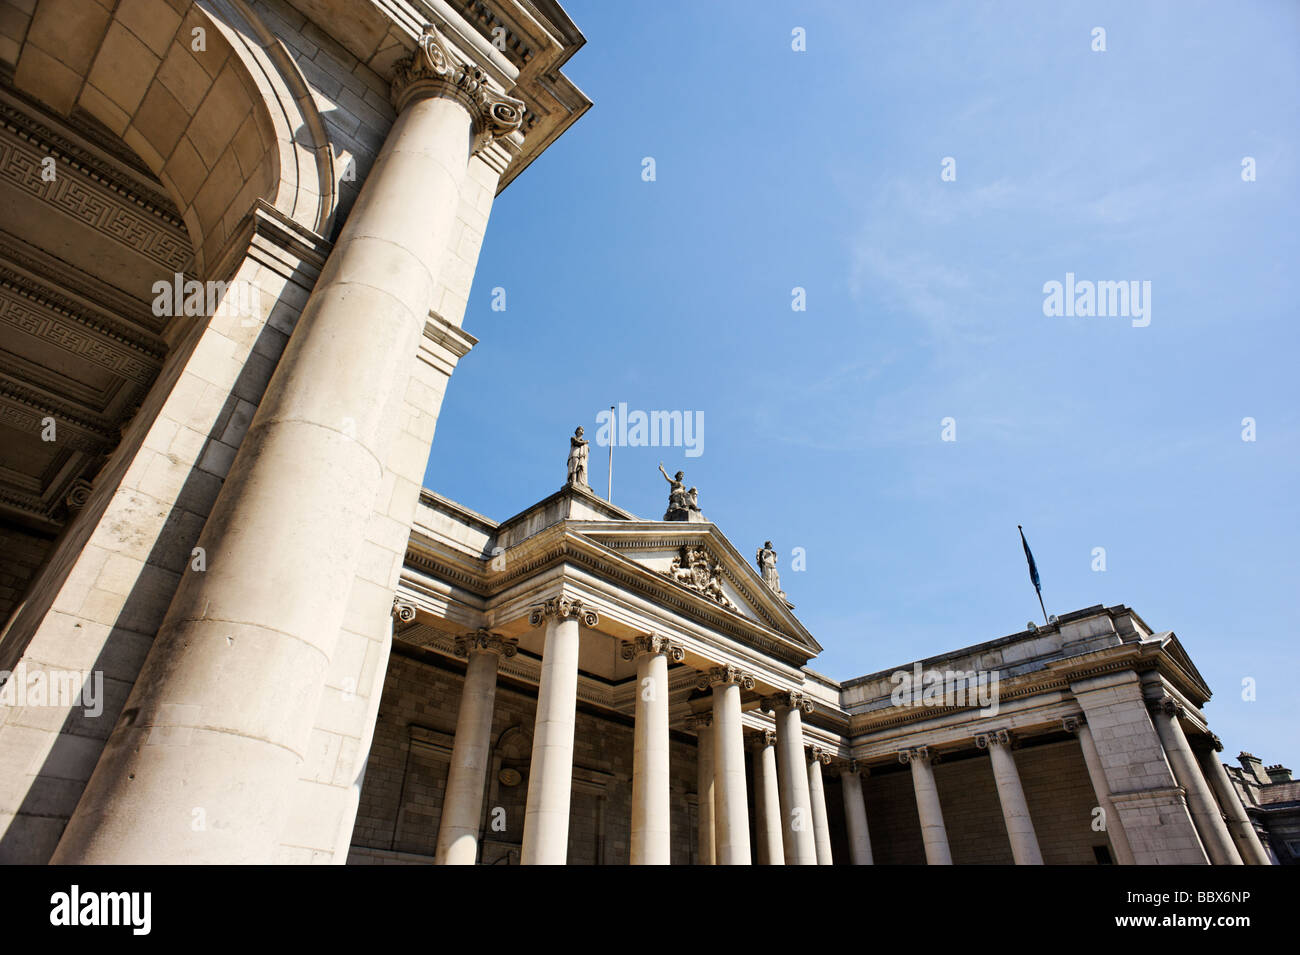 The Bank of Ireland Dublin Republic of Ireland - Stock Image